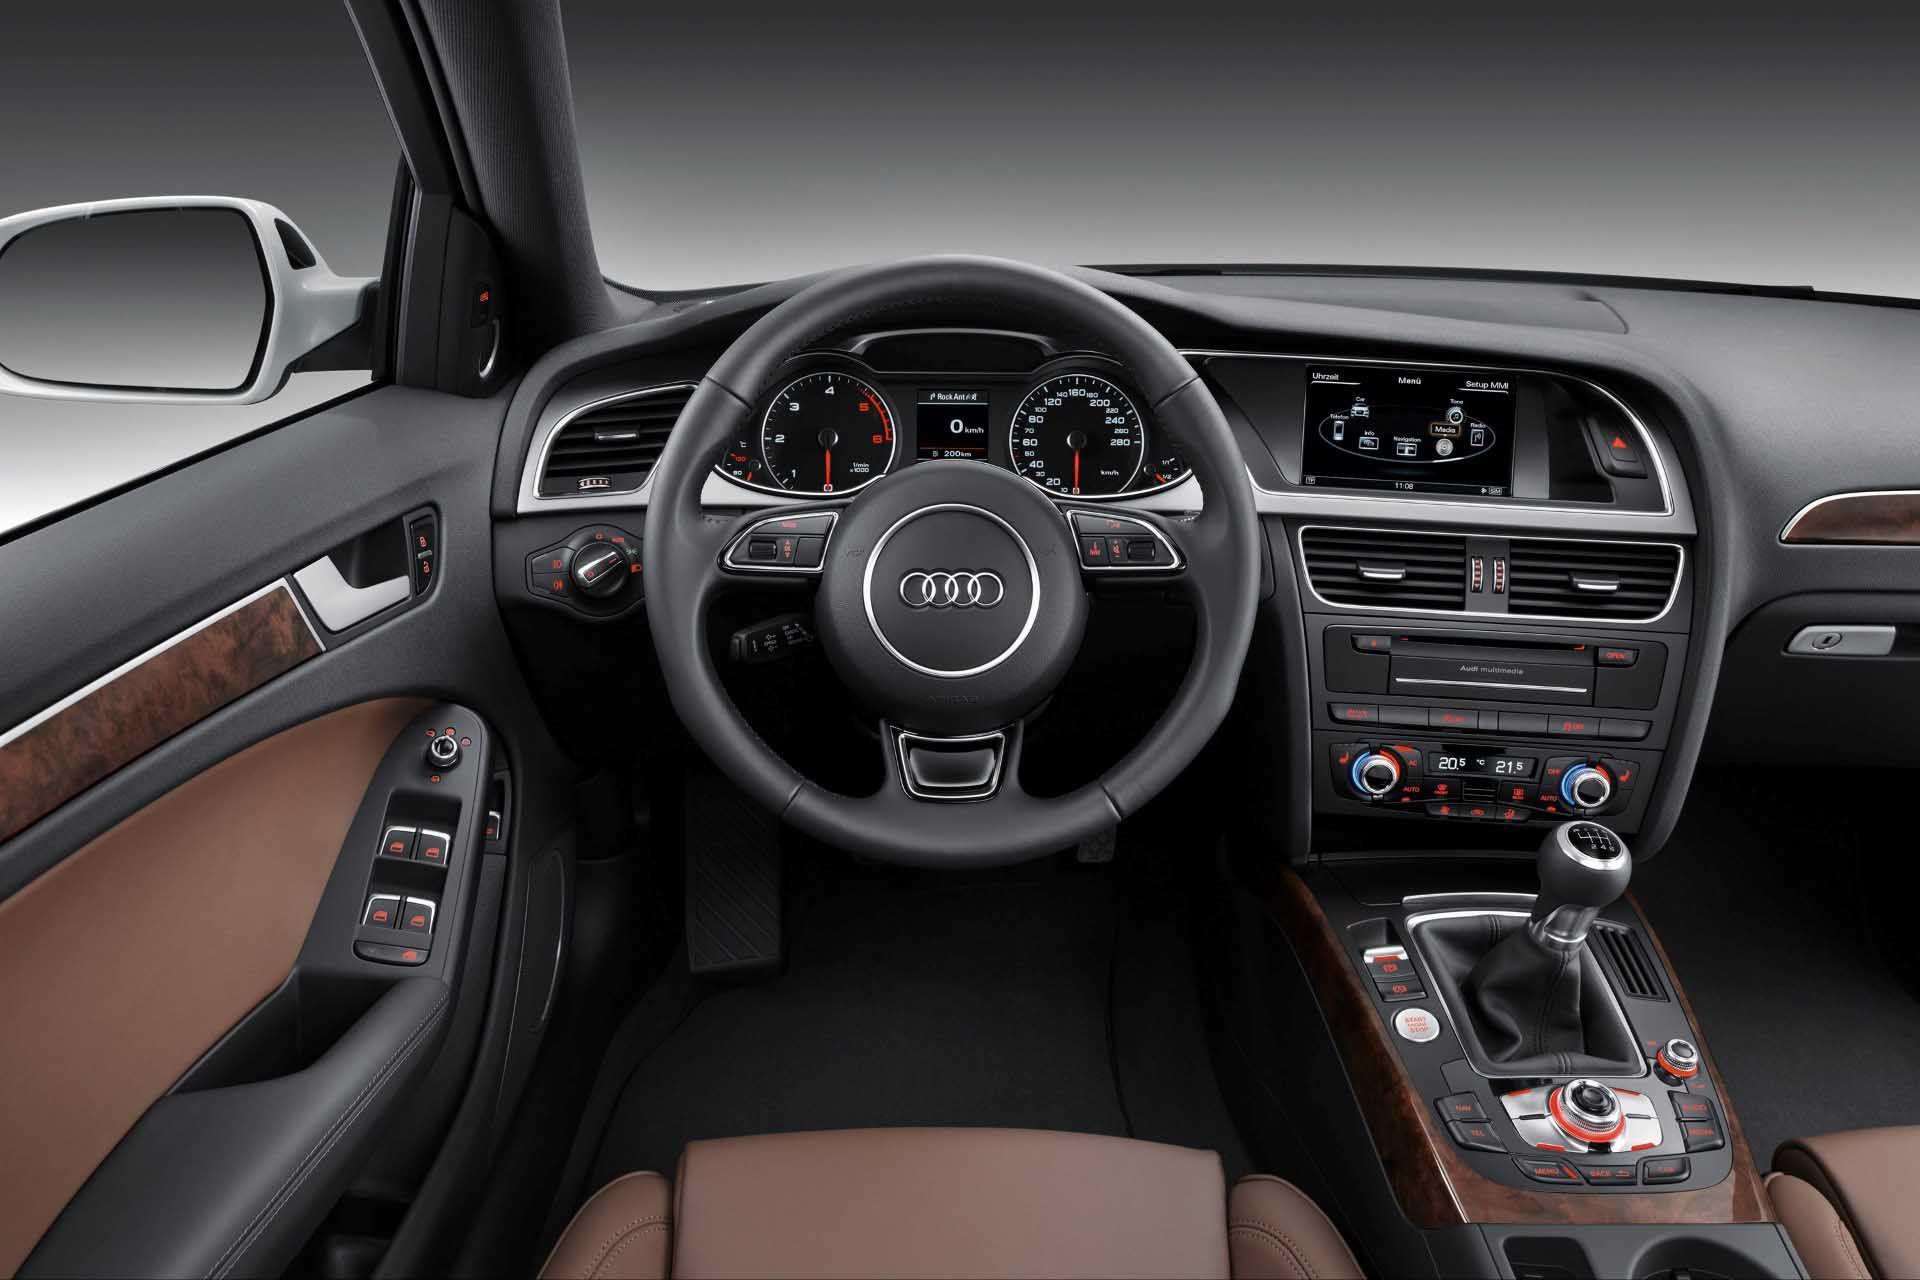 10 Amazing Audi A4 Avant Interior Pics | Audi | Pinterest